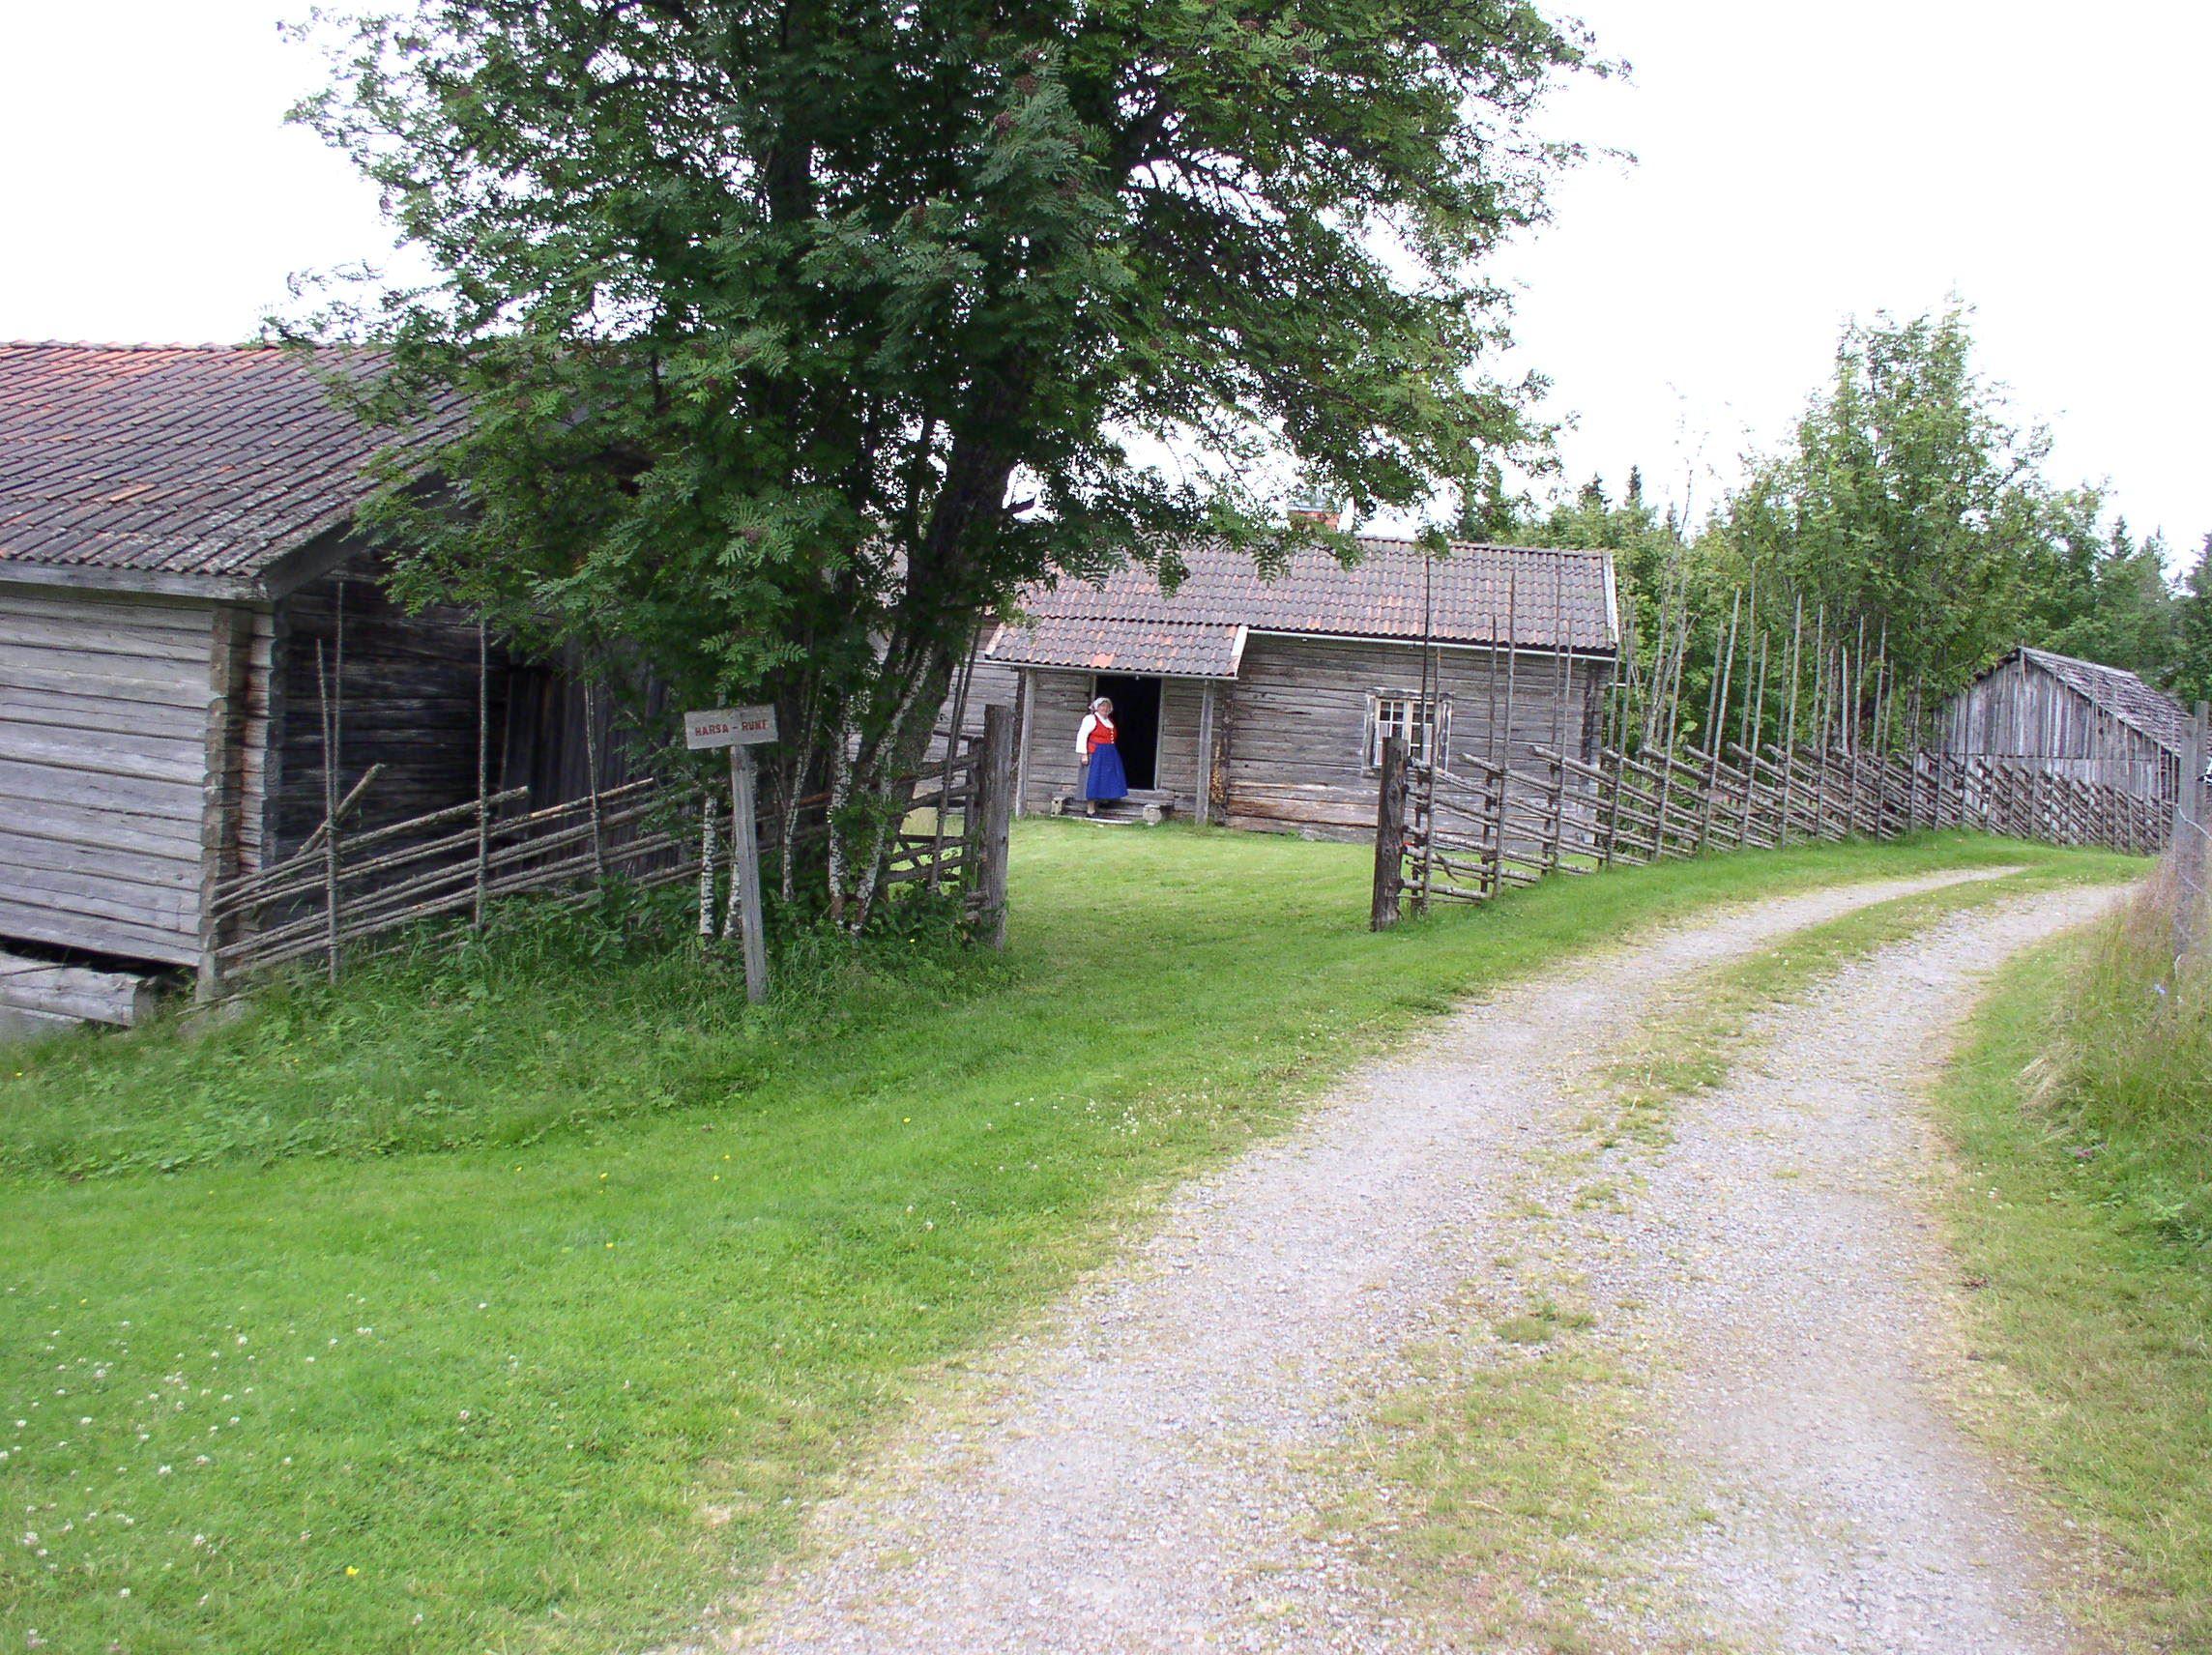 Cecilia Bruce, Harsens Fäbodmuseum